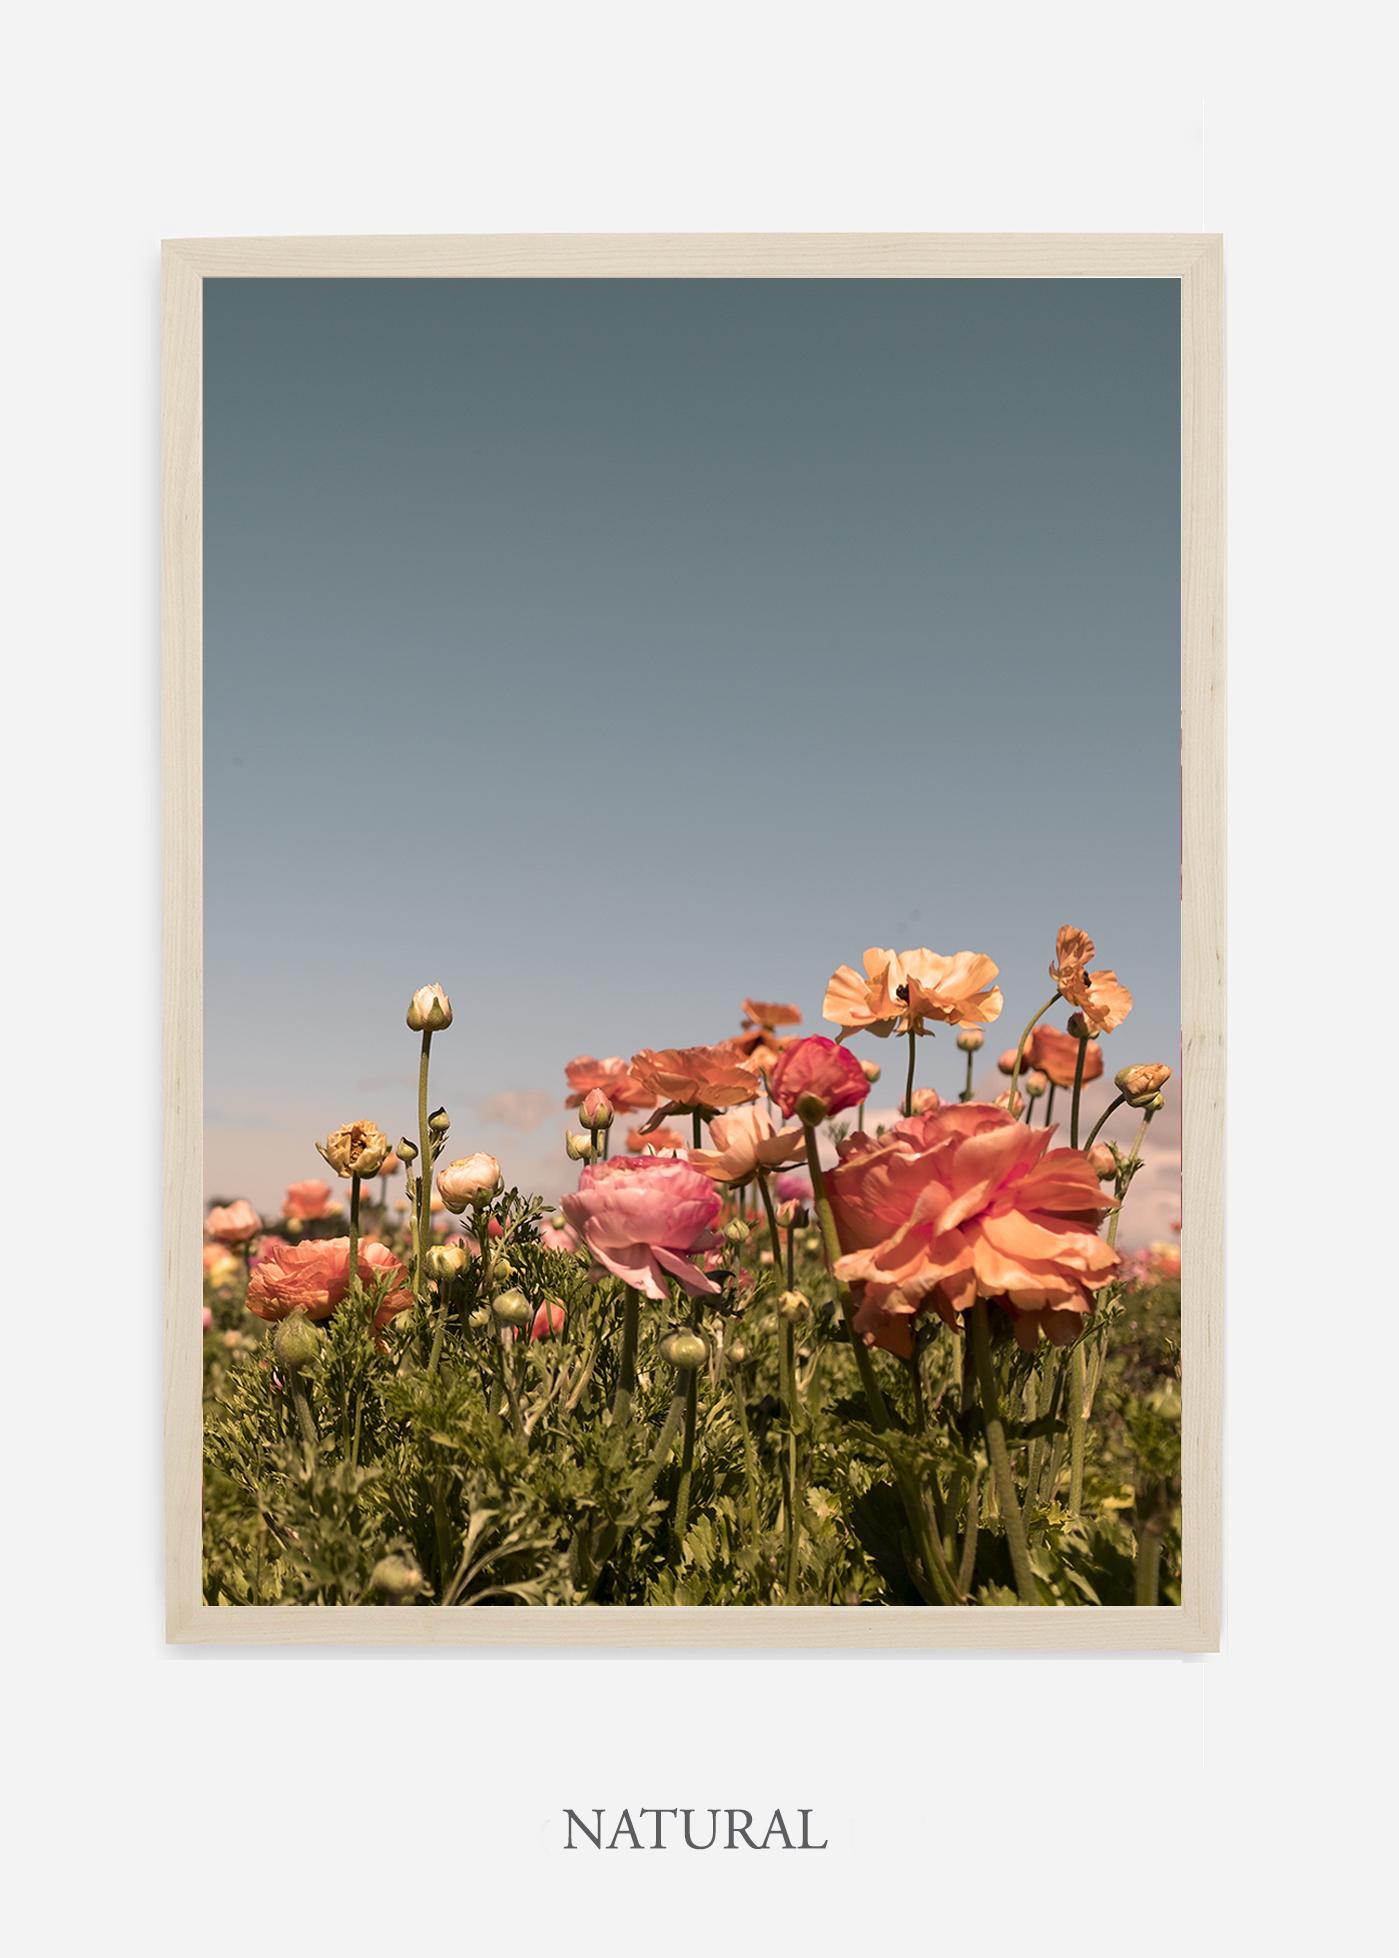 NoMat-Natural-Frame-Floral-No-1-Wilder-California-Art-Floral-Home-decor-Prints-Dahlia-Botanical-Artwork-Interior-design.jpg